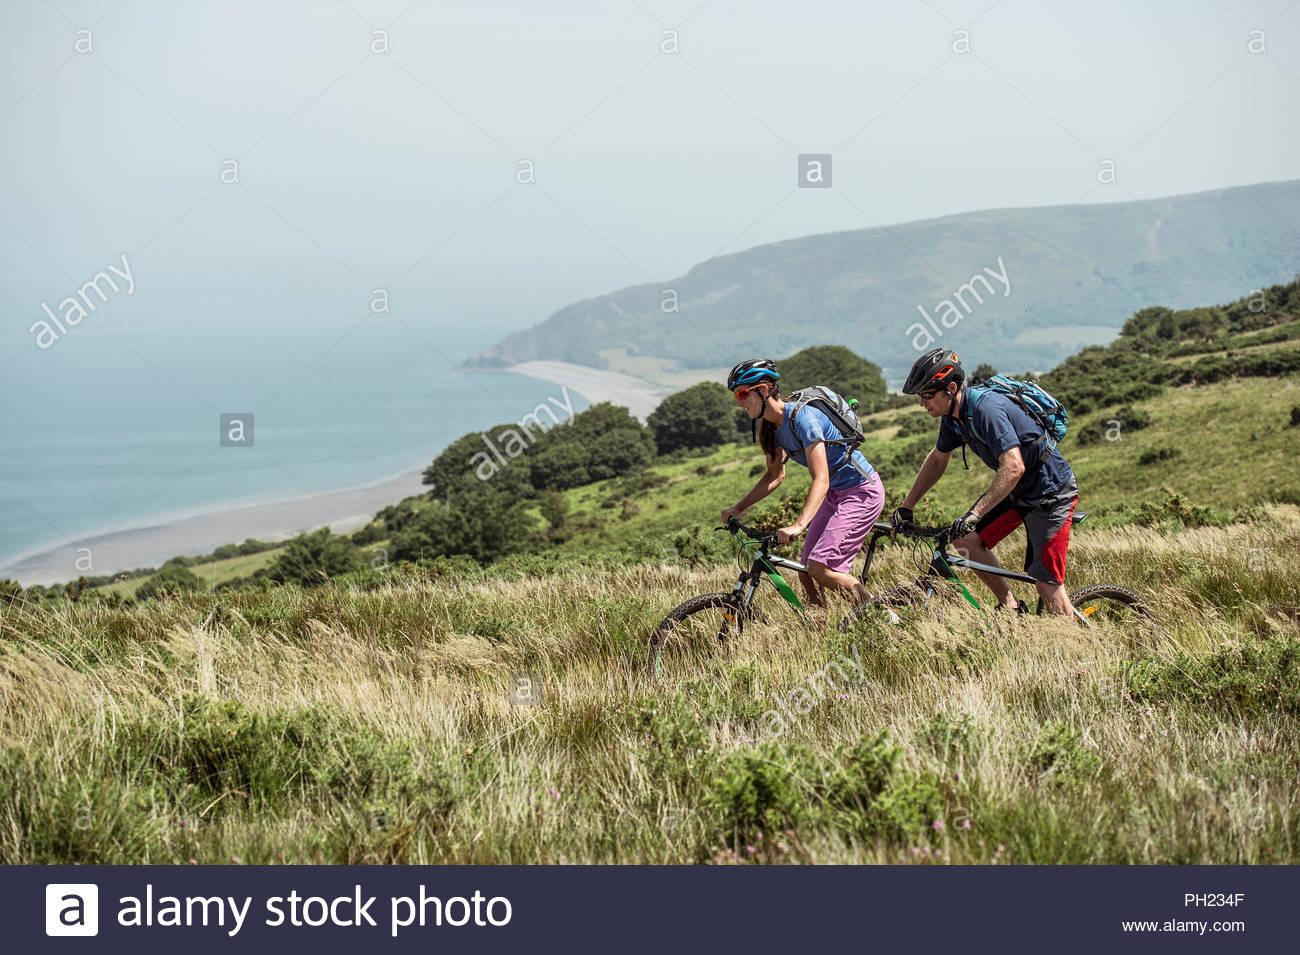 Paar Mountainbiken auf Hügel in Porlock Wehr, England Stockfoto